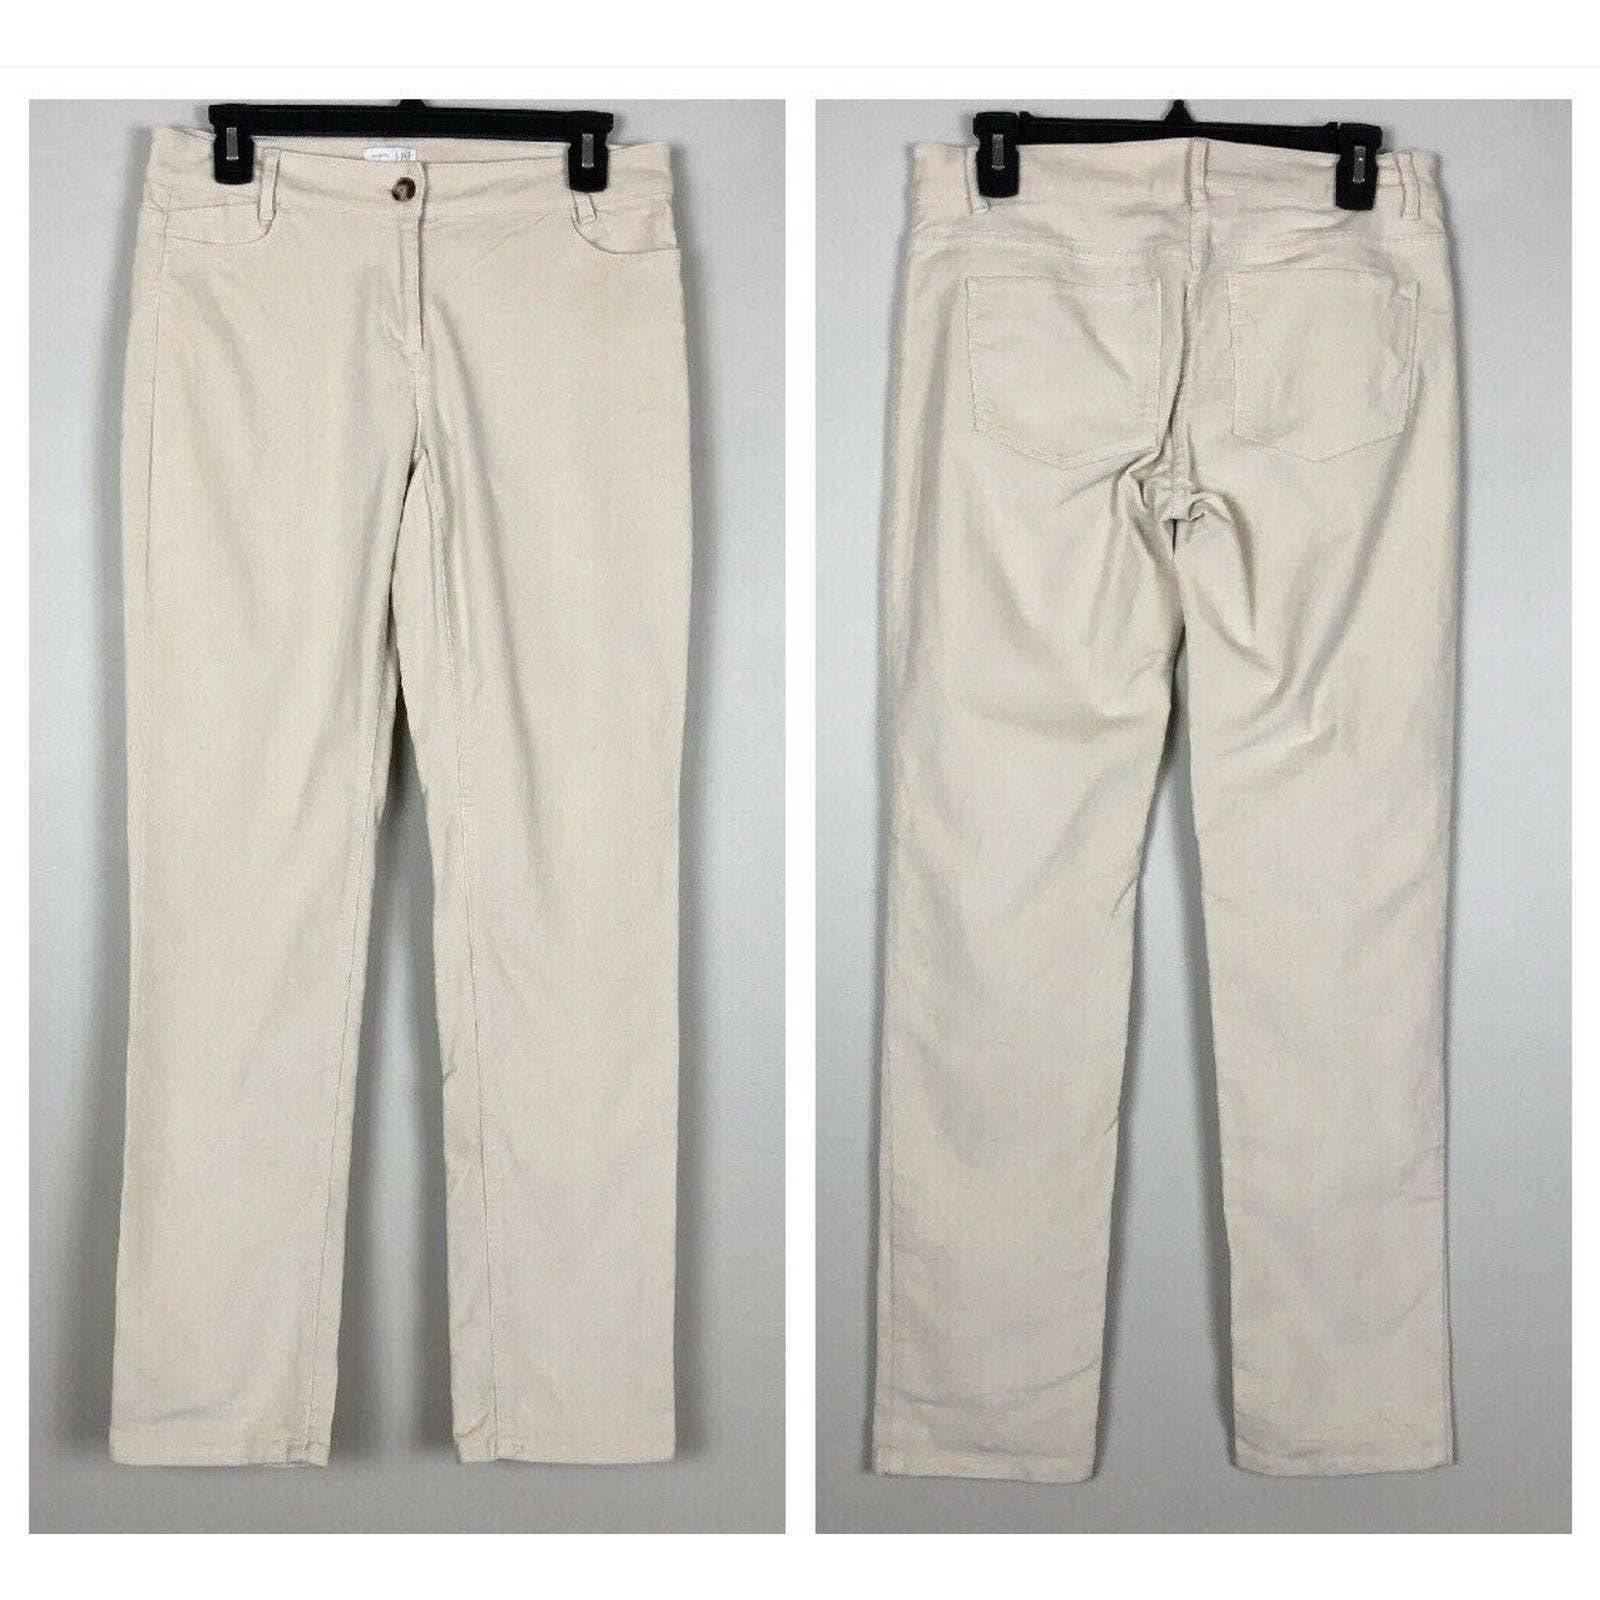 J Jill Corduroy Pants 2 Cream Beige